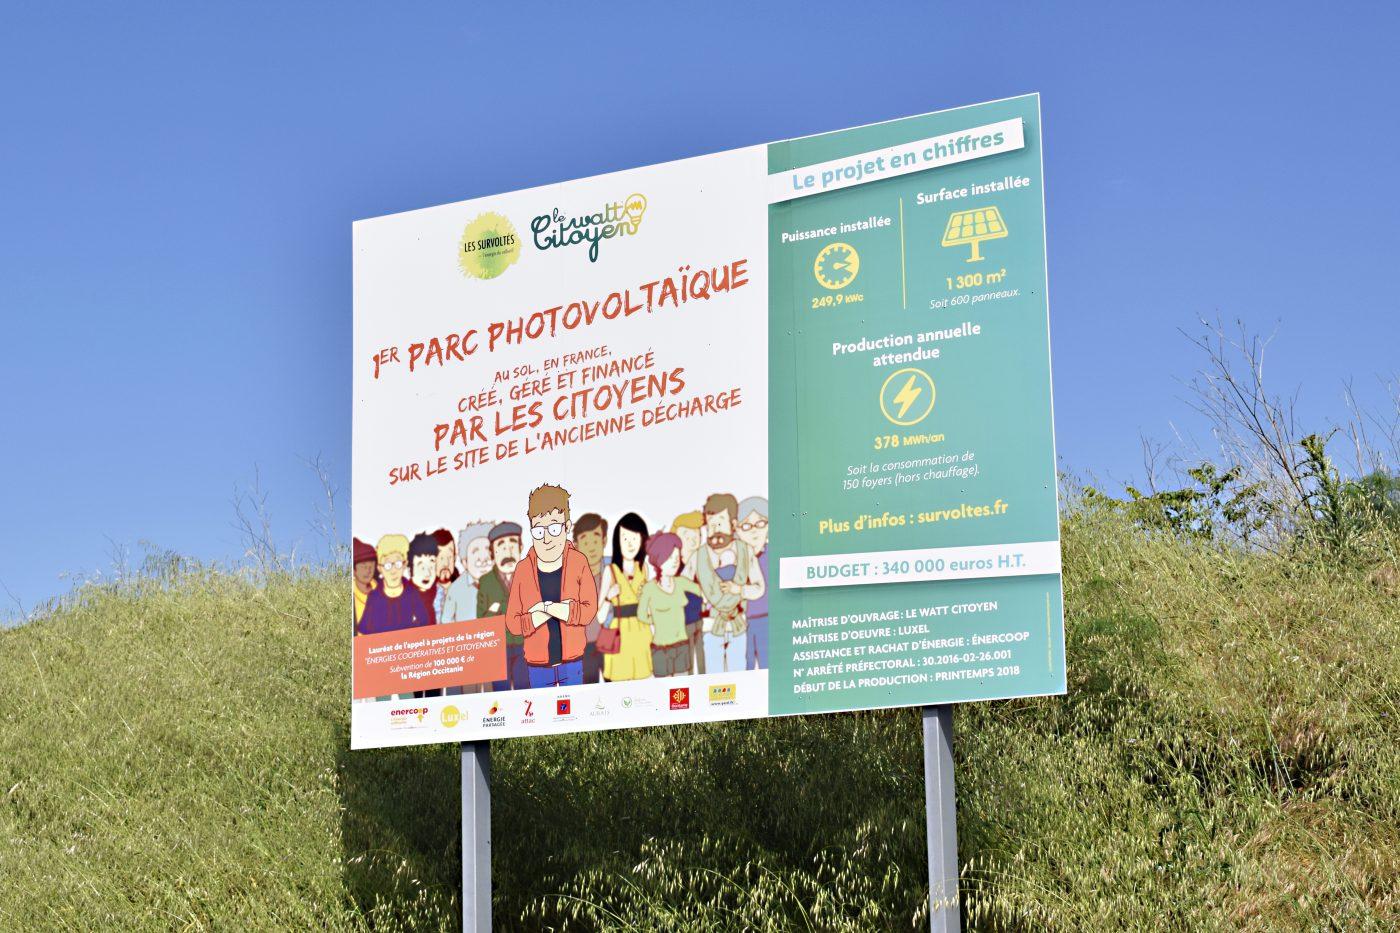 inauguration-parc-photovoltaique